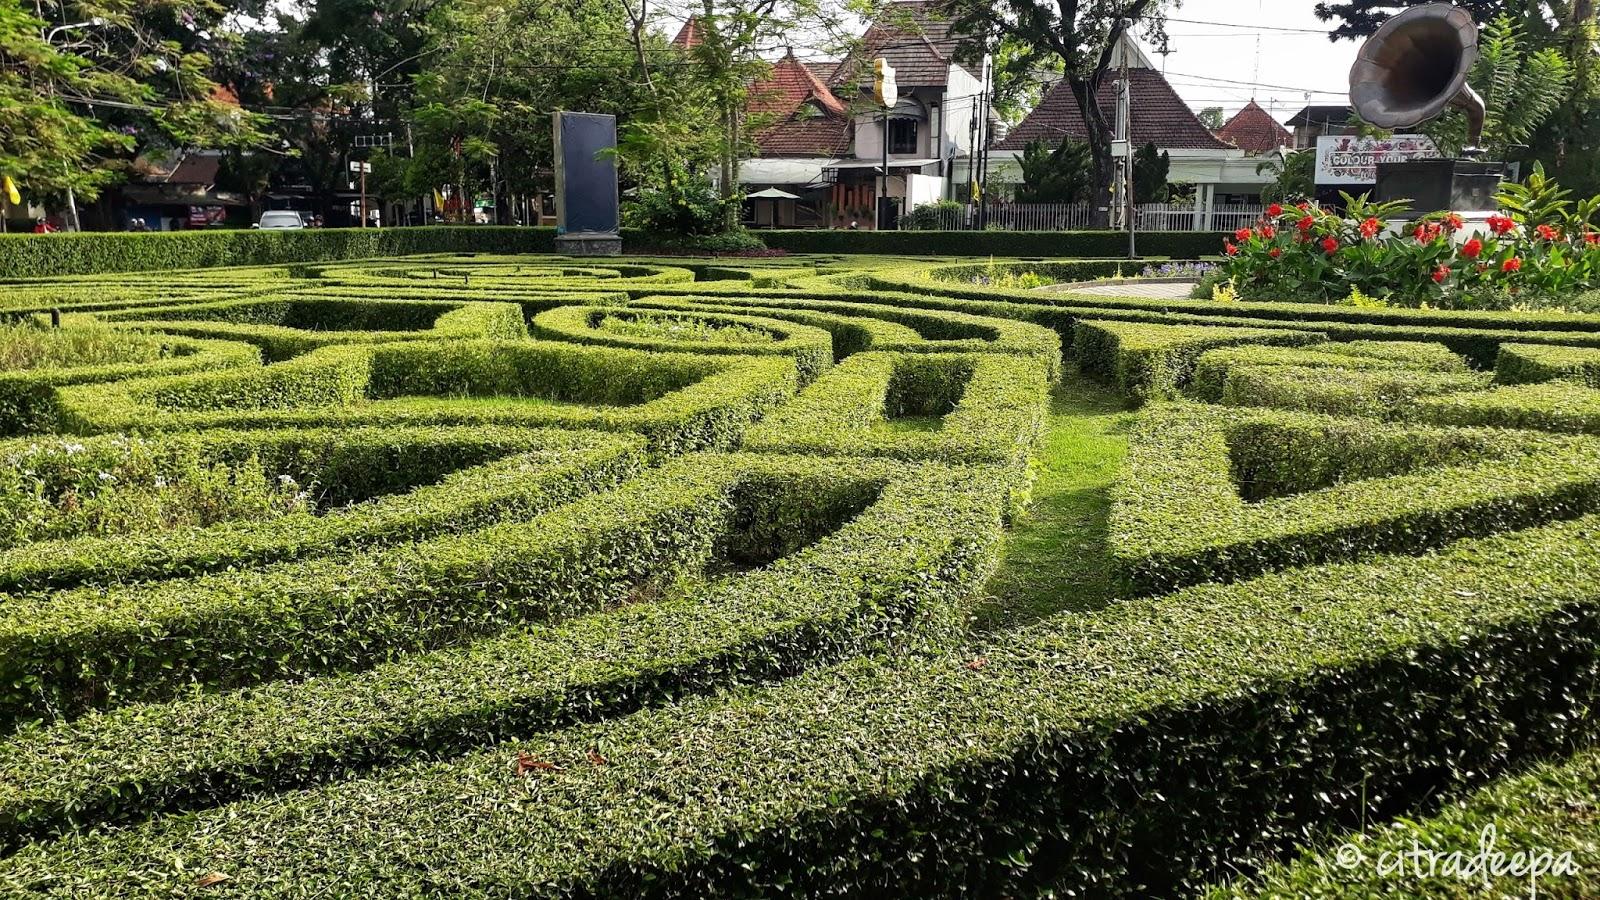 Taman Terompet Malang Day 5 Dandelions Bikin Tambah Nyenengin Liat